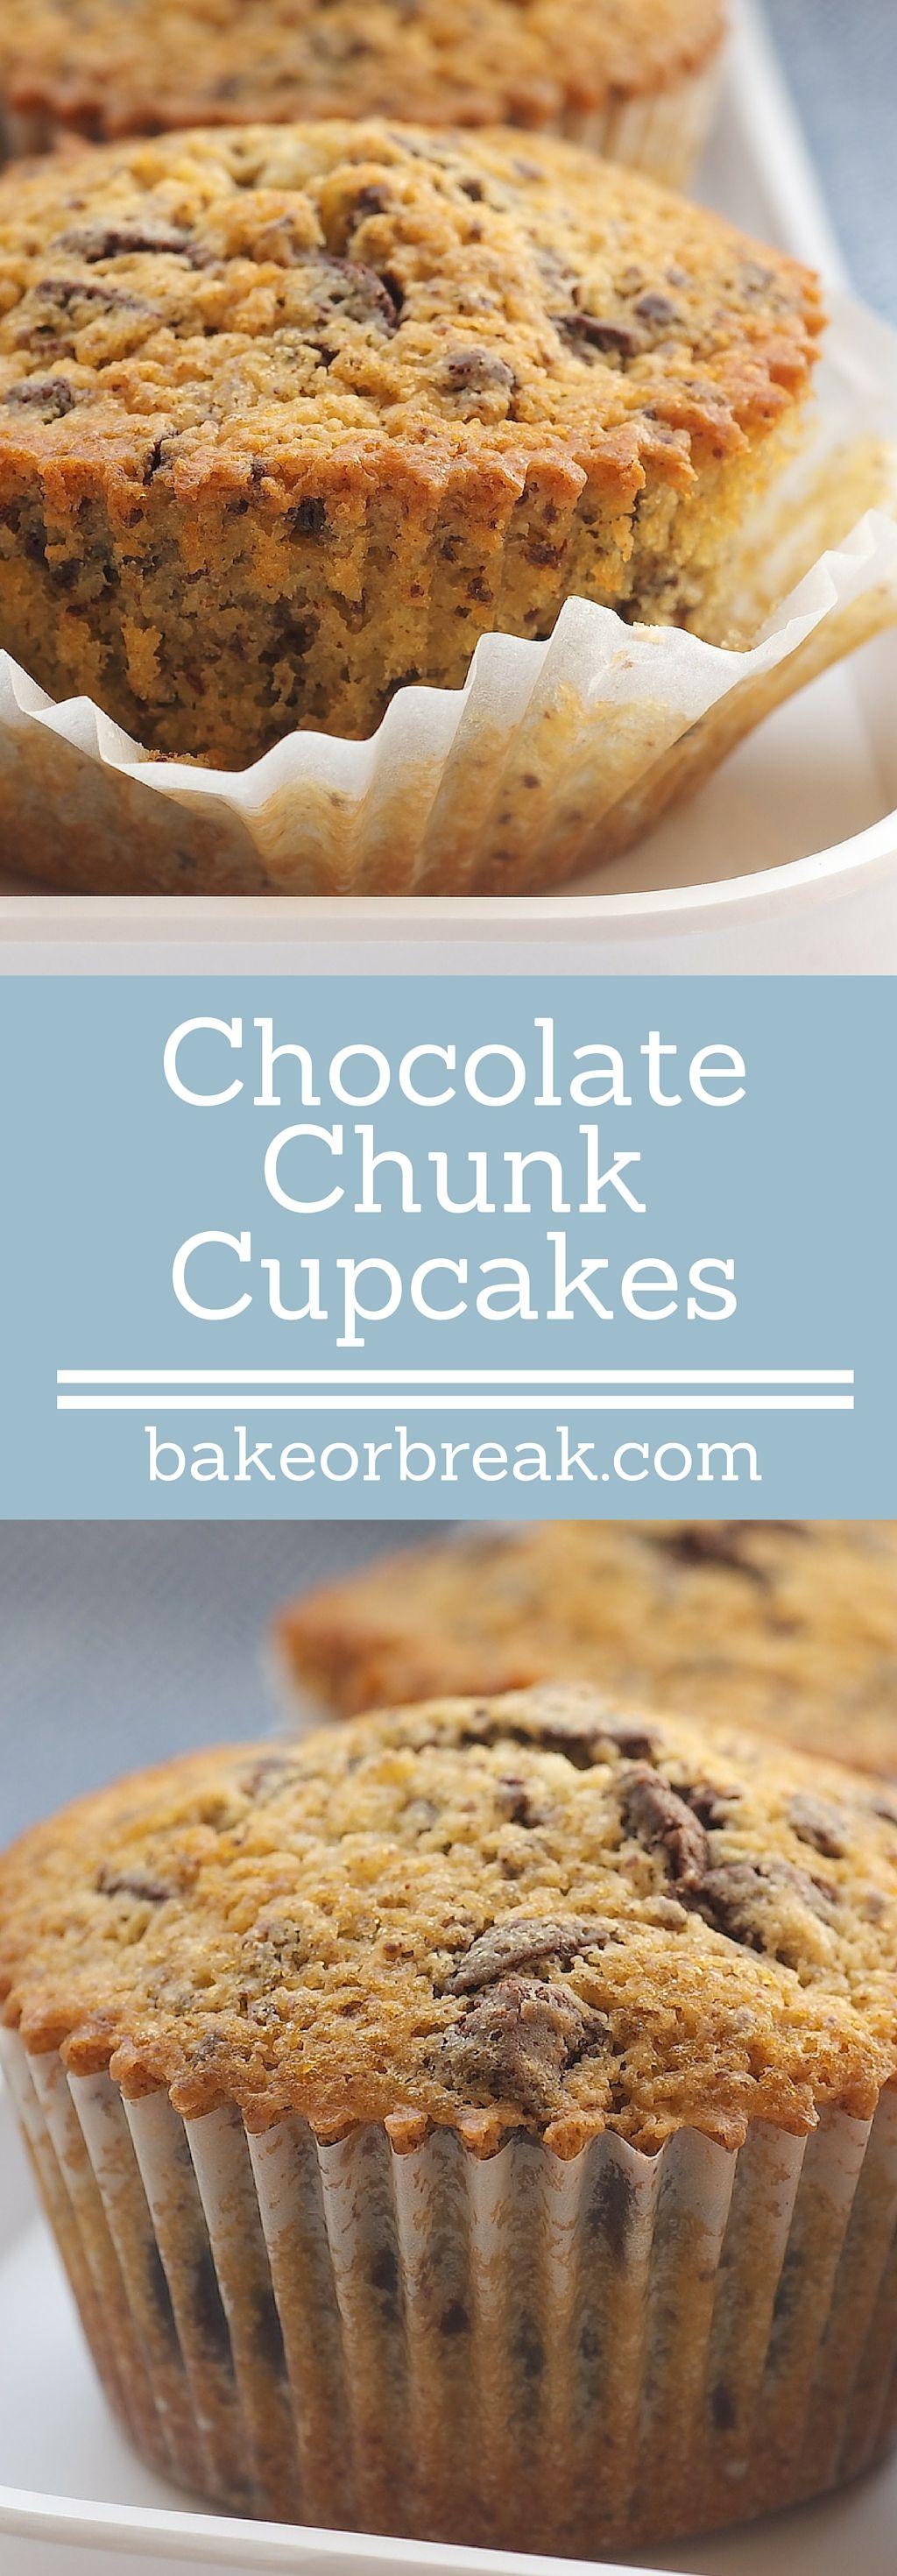 Chocolate Chunk Cupcakes   Recipe   Chocolate, Cake and Tarts